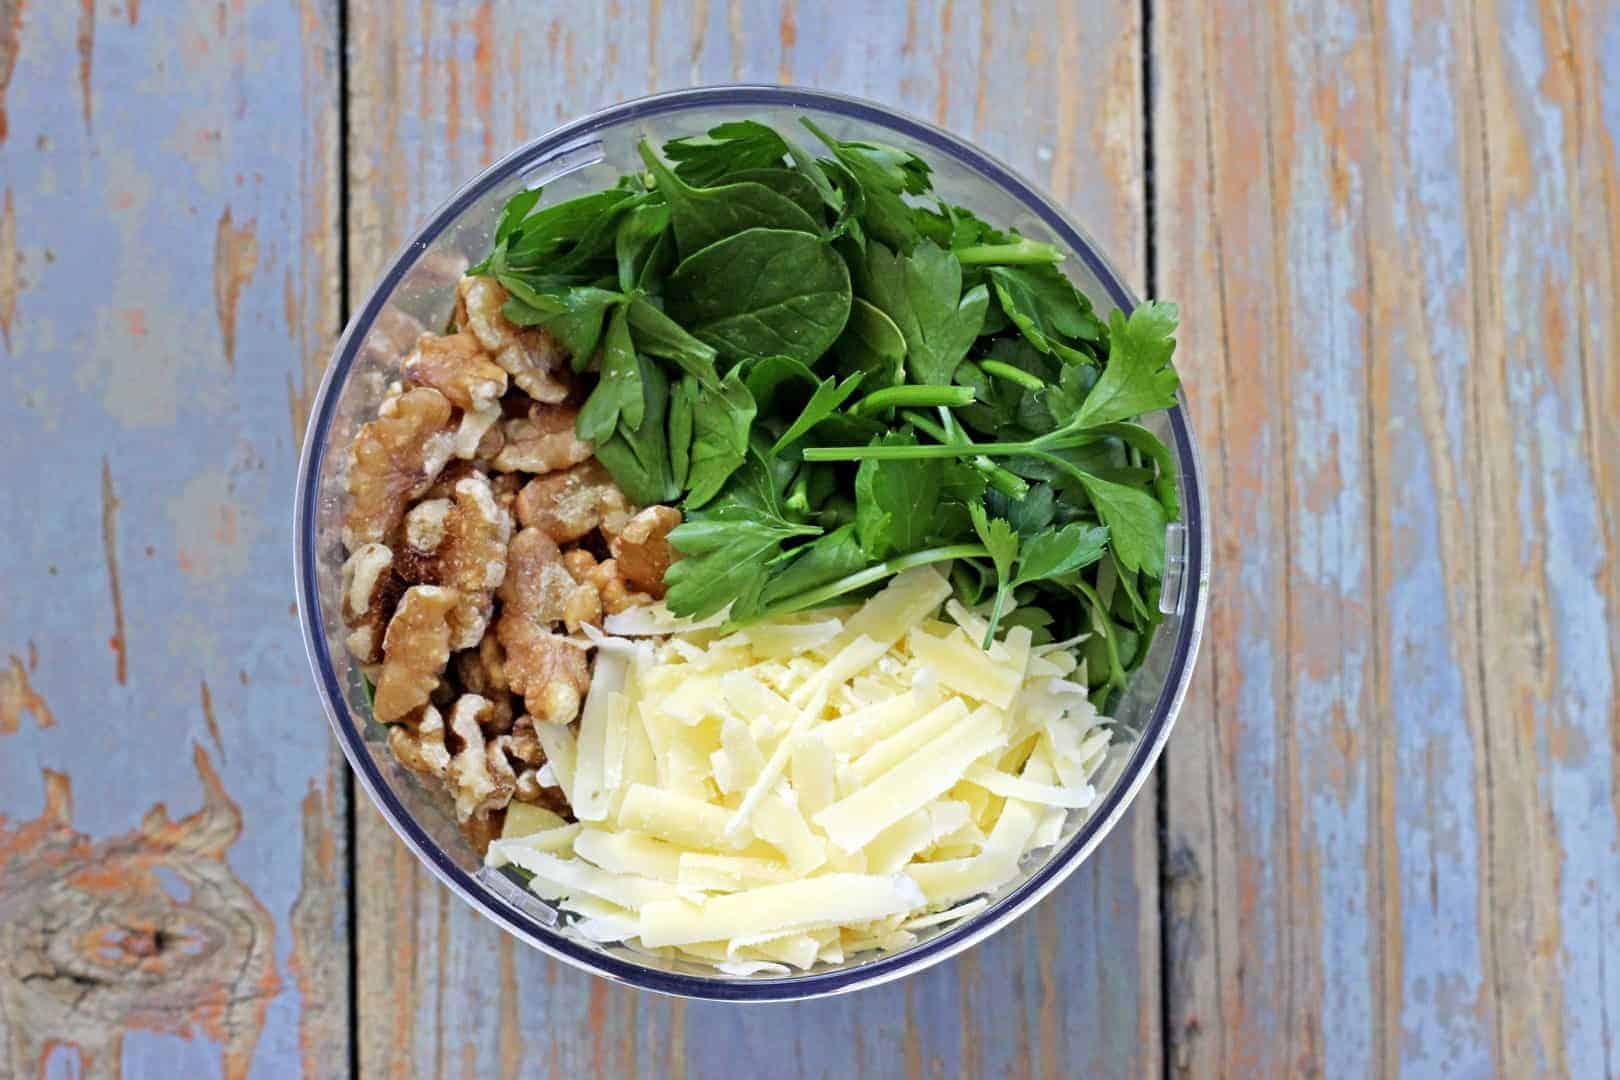 Spinach & Walnut Pesto (1)